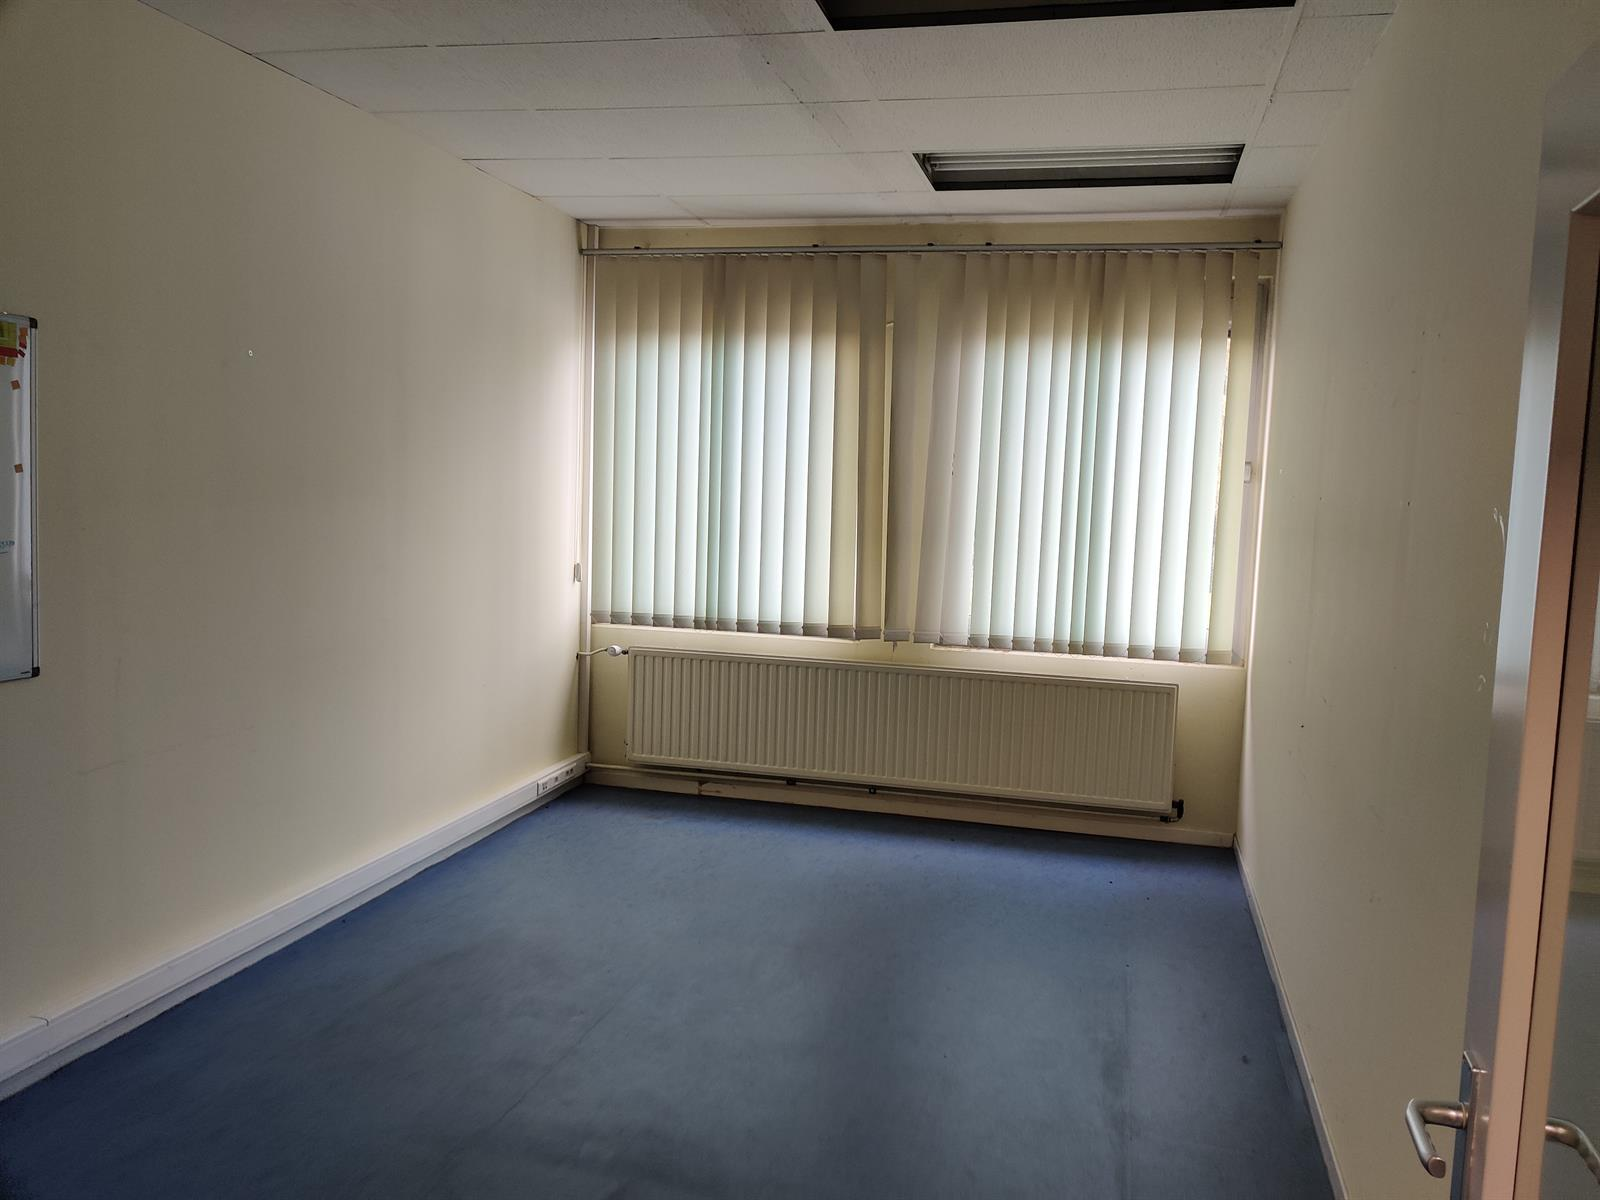 gebouw voor gemengd gebruik te huur I173 - Quatrieme Rue , 6040 Charleroi Jumet, België 19